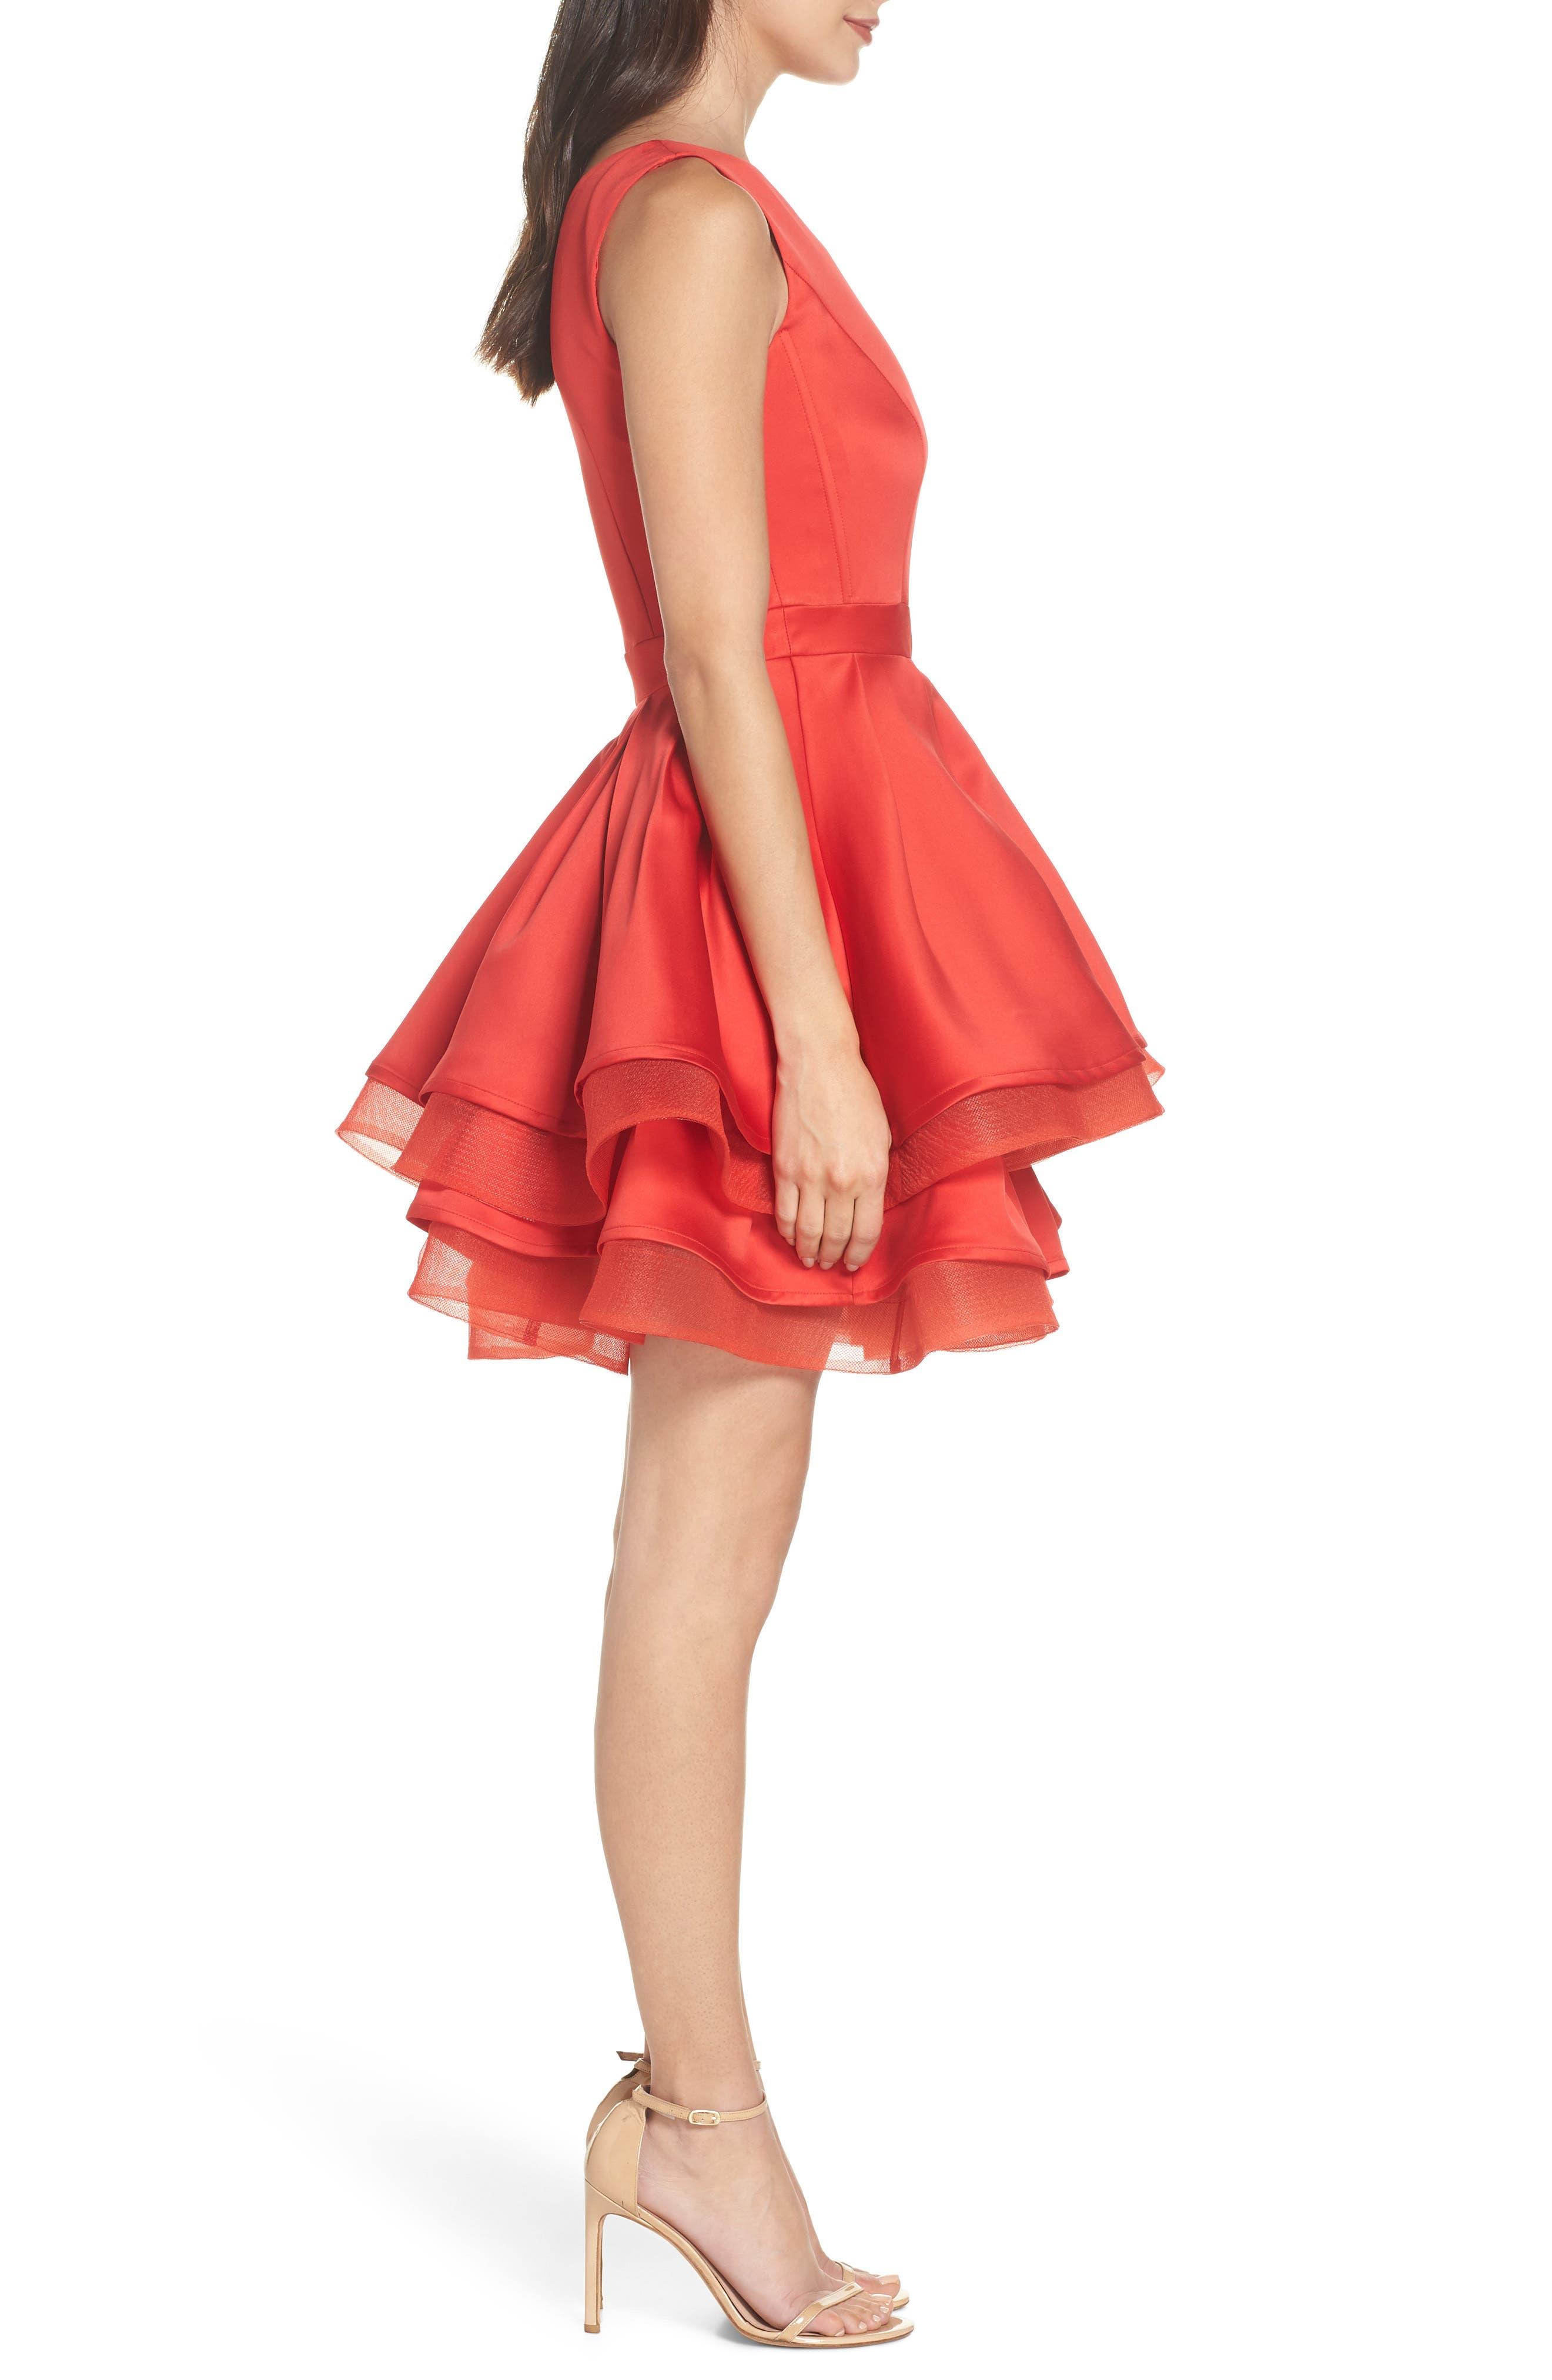 Emmanuel One-Shoulder Party Dress,                             Alternate thumbnail 3, color,                             600